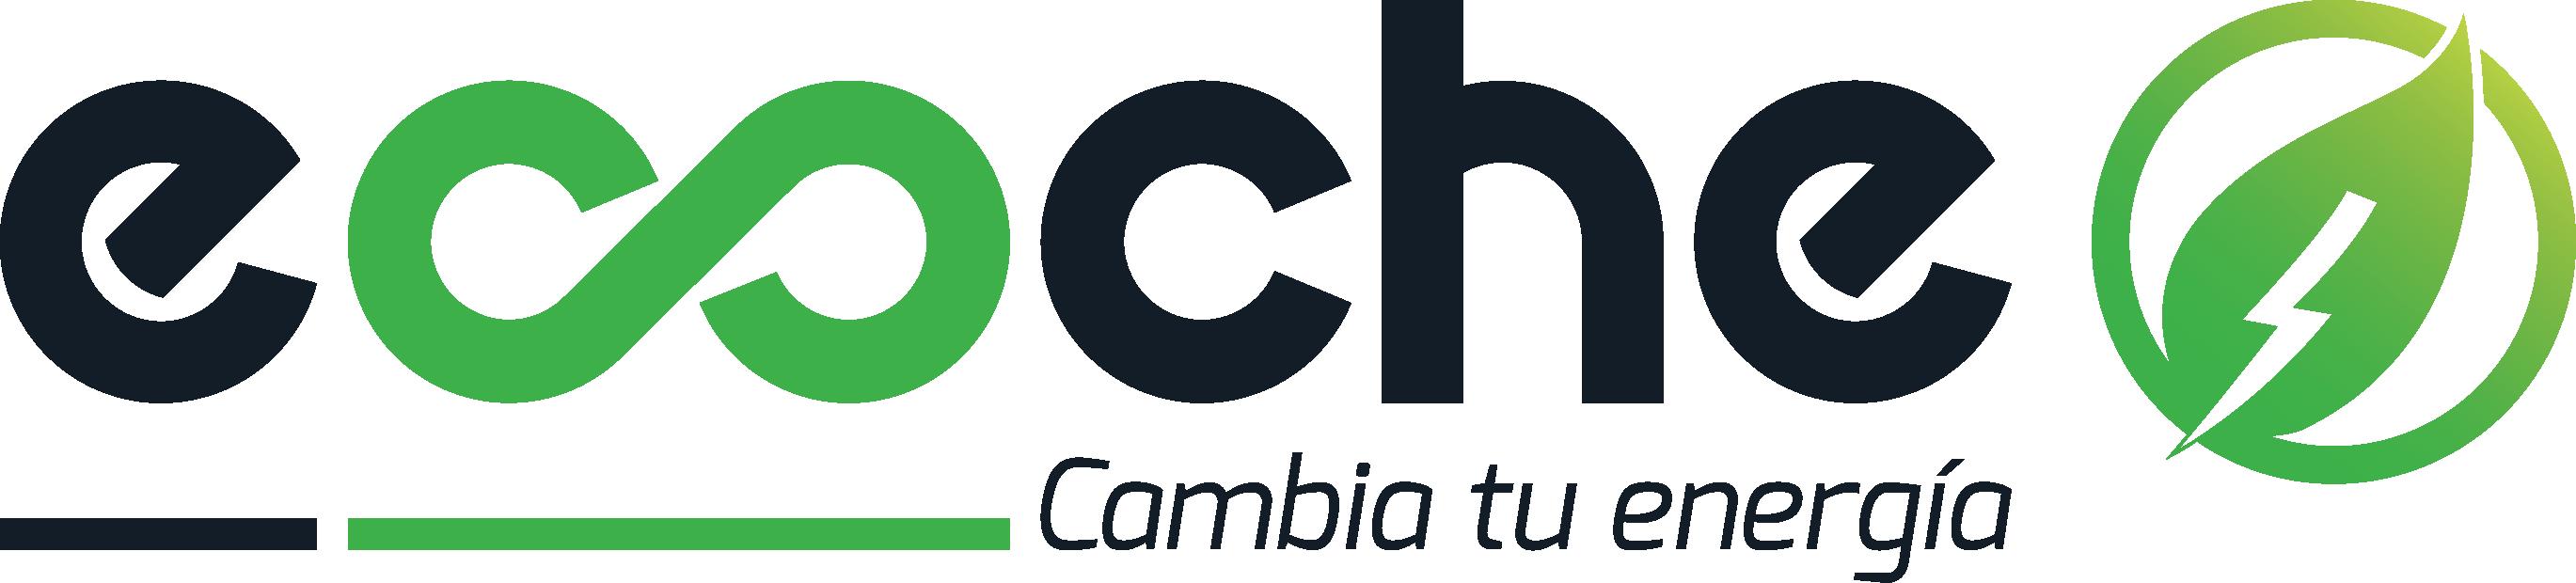 Ecoche – Conversión de vehículo de combustión interna a vehículo eléctrico